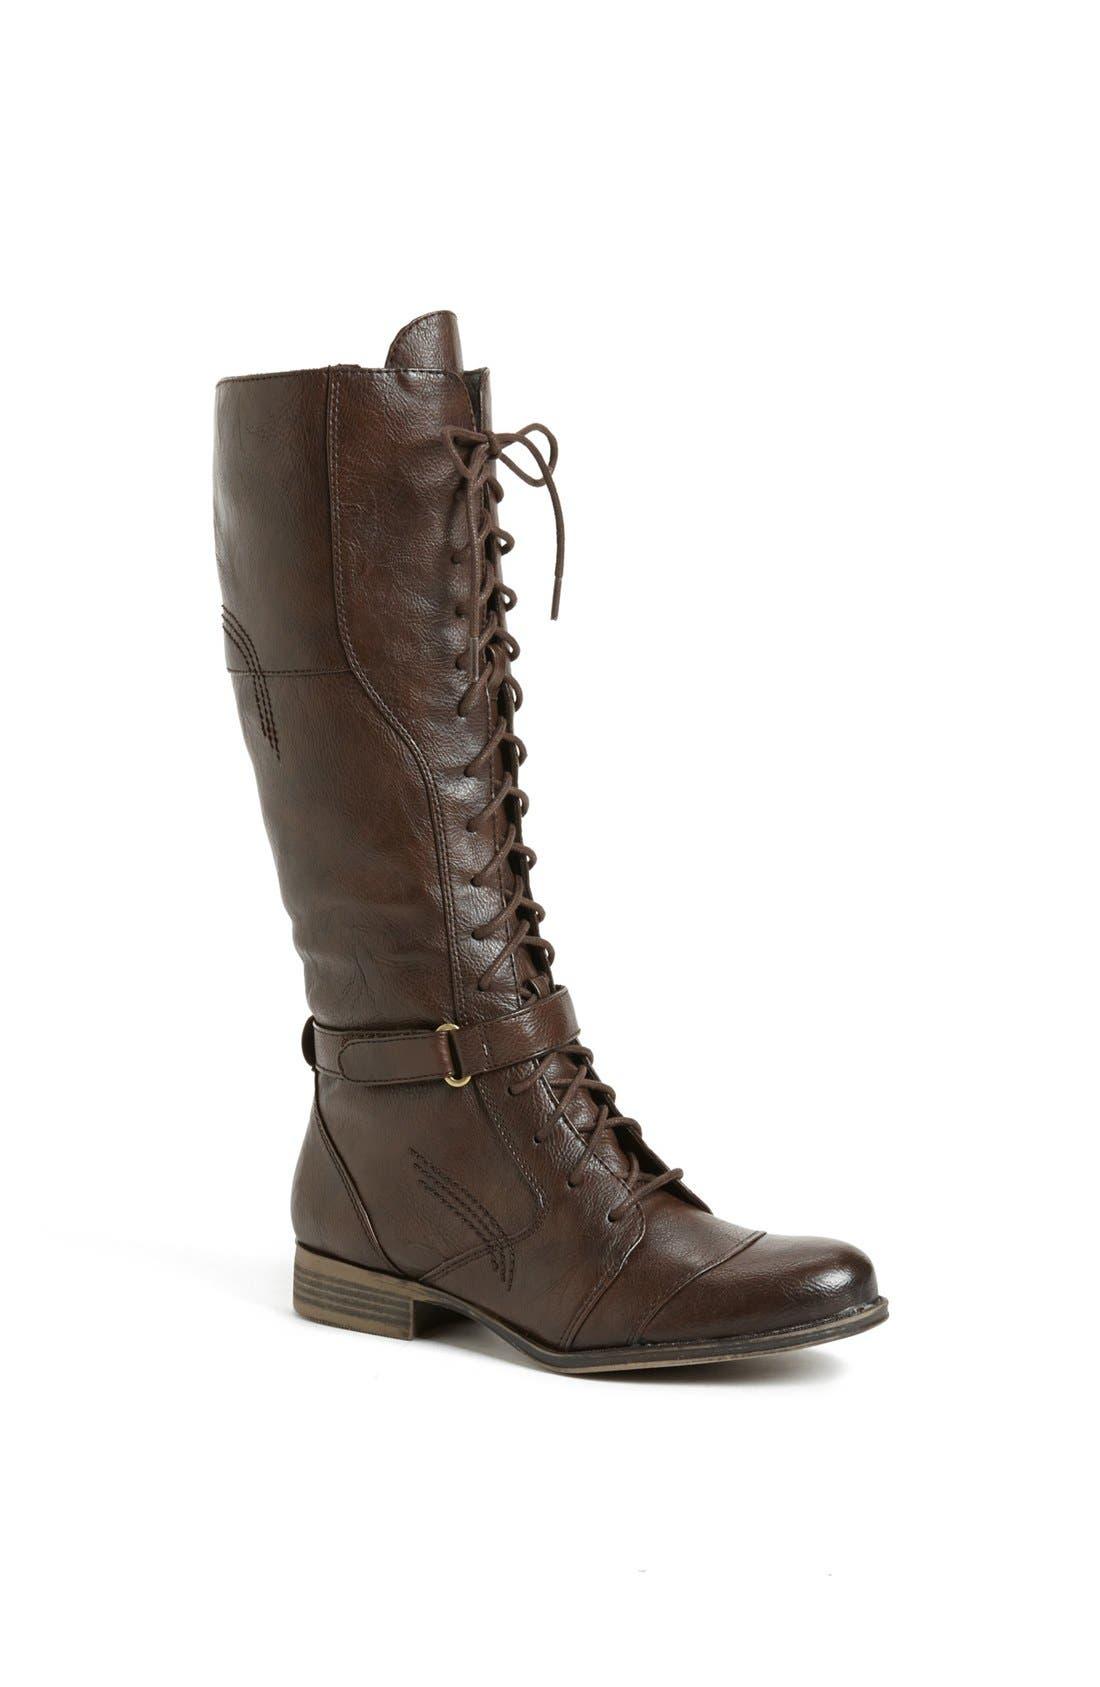 Main Image - Naturalizer 'Jakes' Boot (Wide Calf)